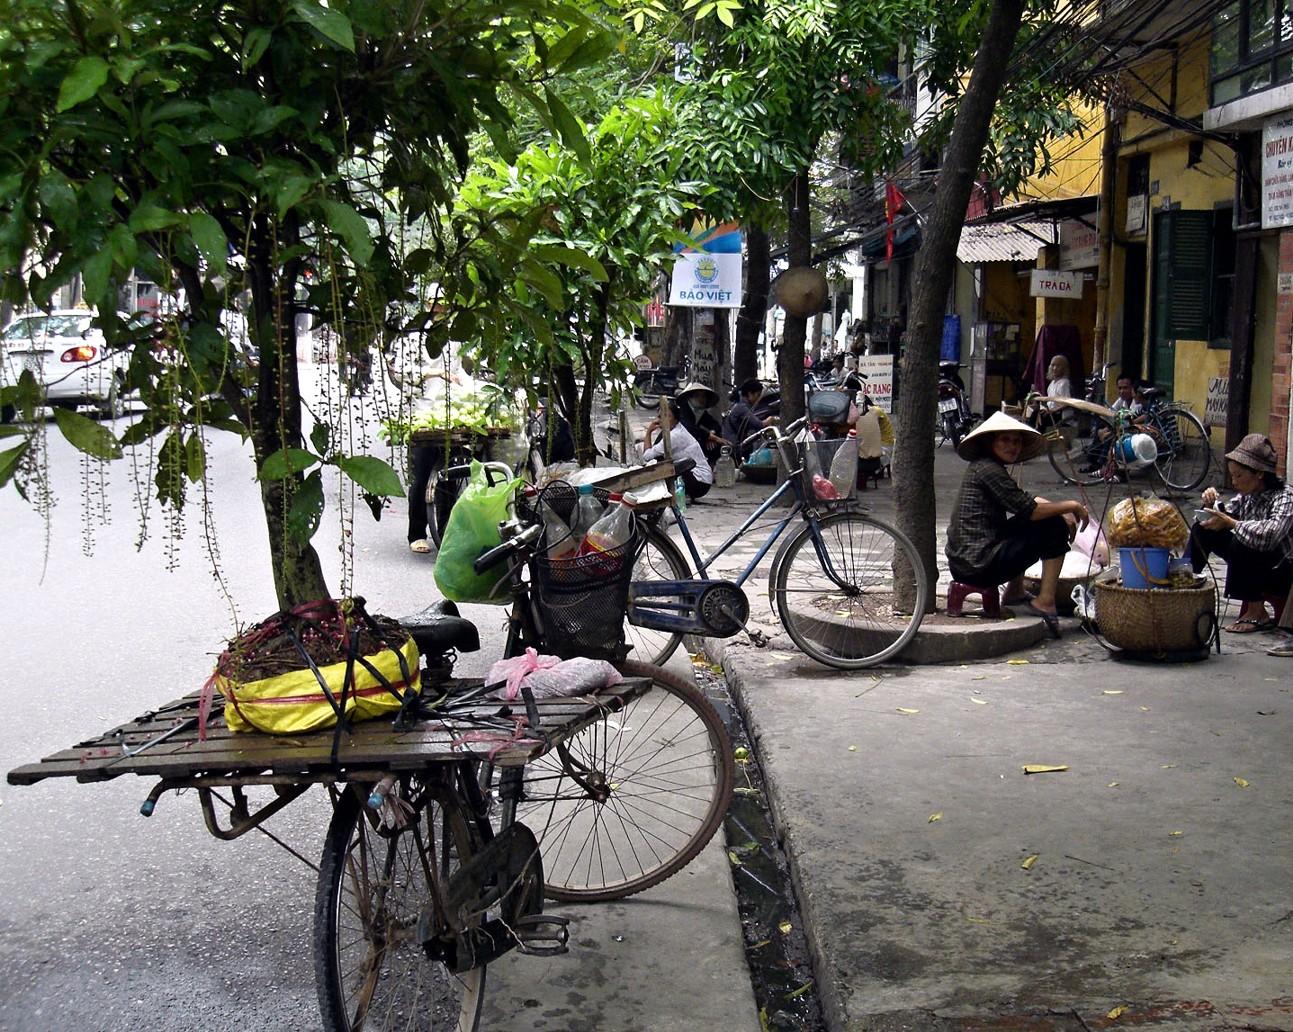 Name:Old quarter Hanoi Original source: https://commons.wikimedia.org/wiki/File:Hanoi_Downtown_Street_Life.jpg